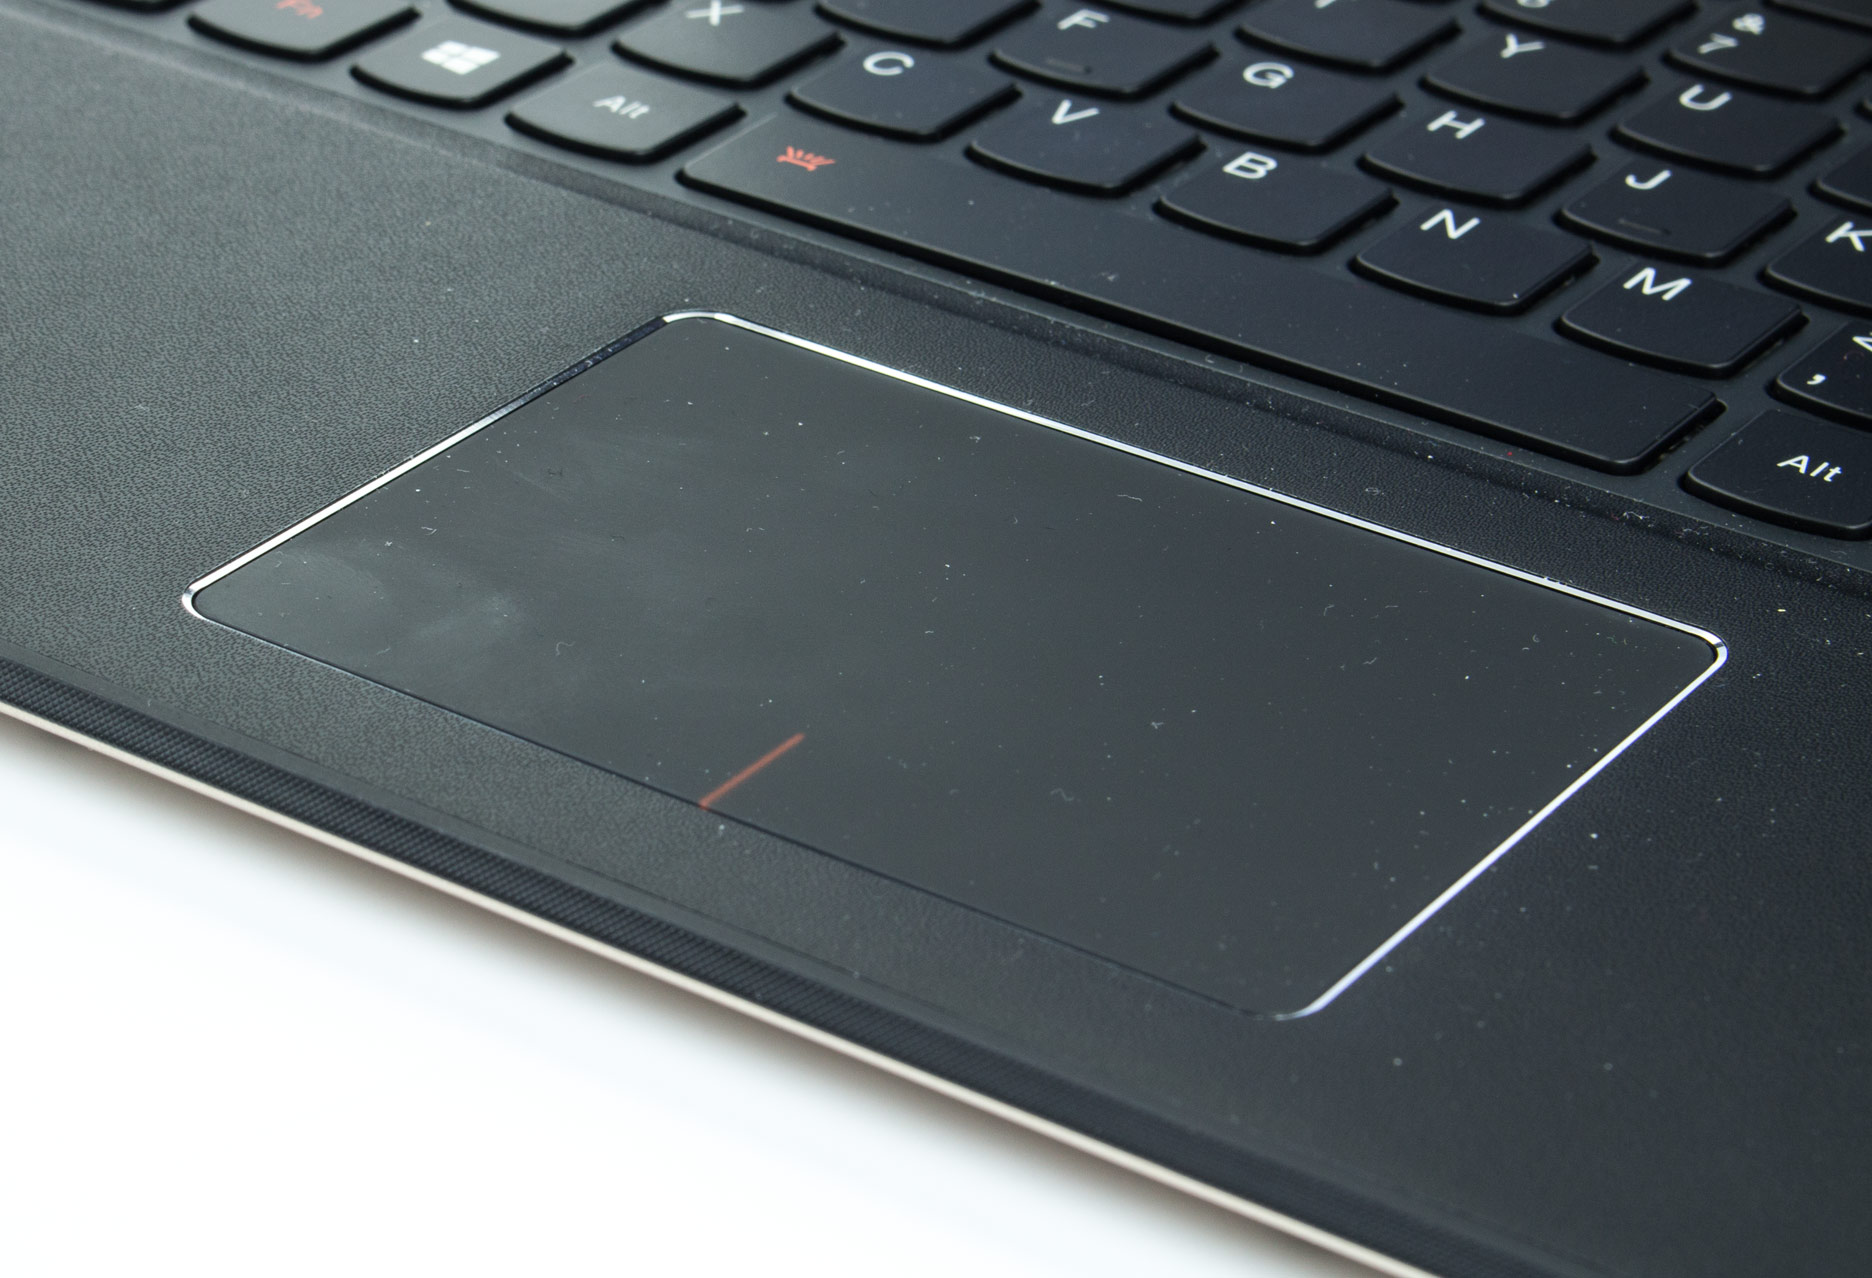 Lenovo Yoga 900 touchpad